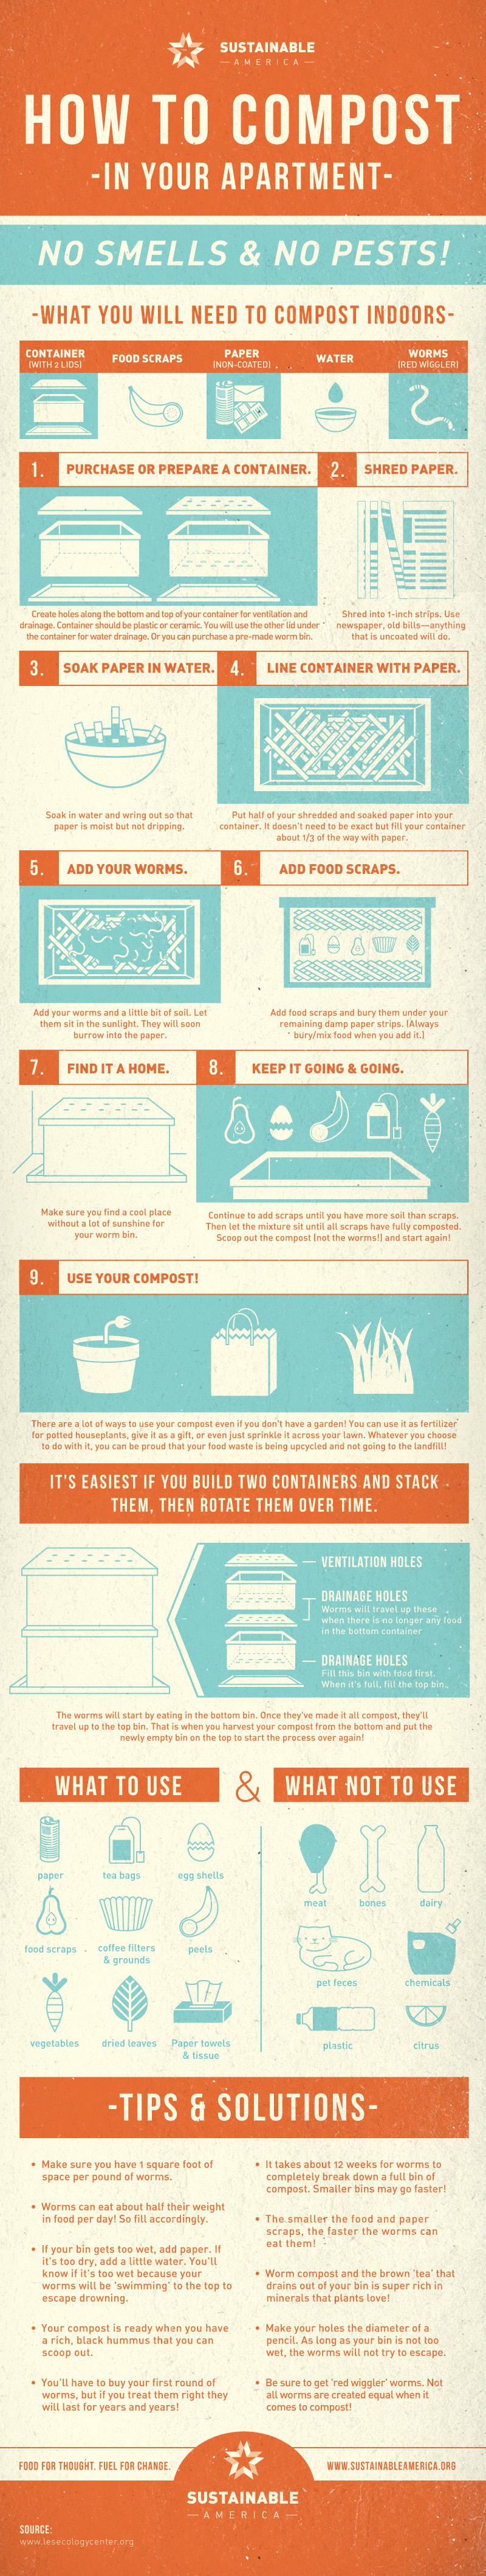 compost_Upworthy